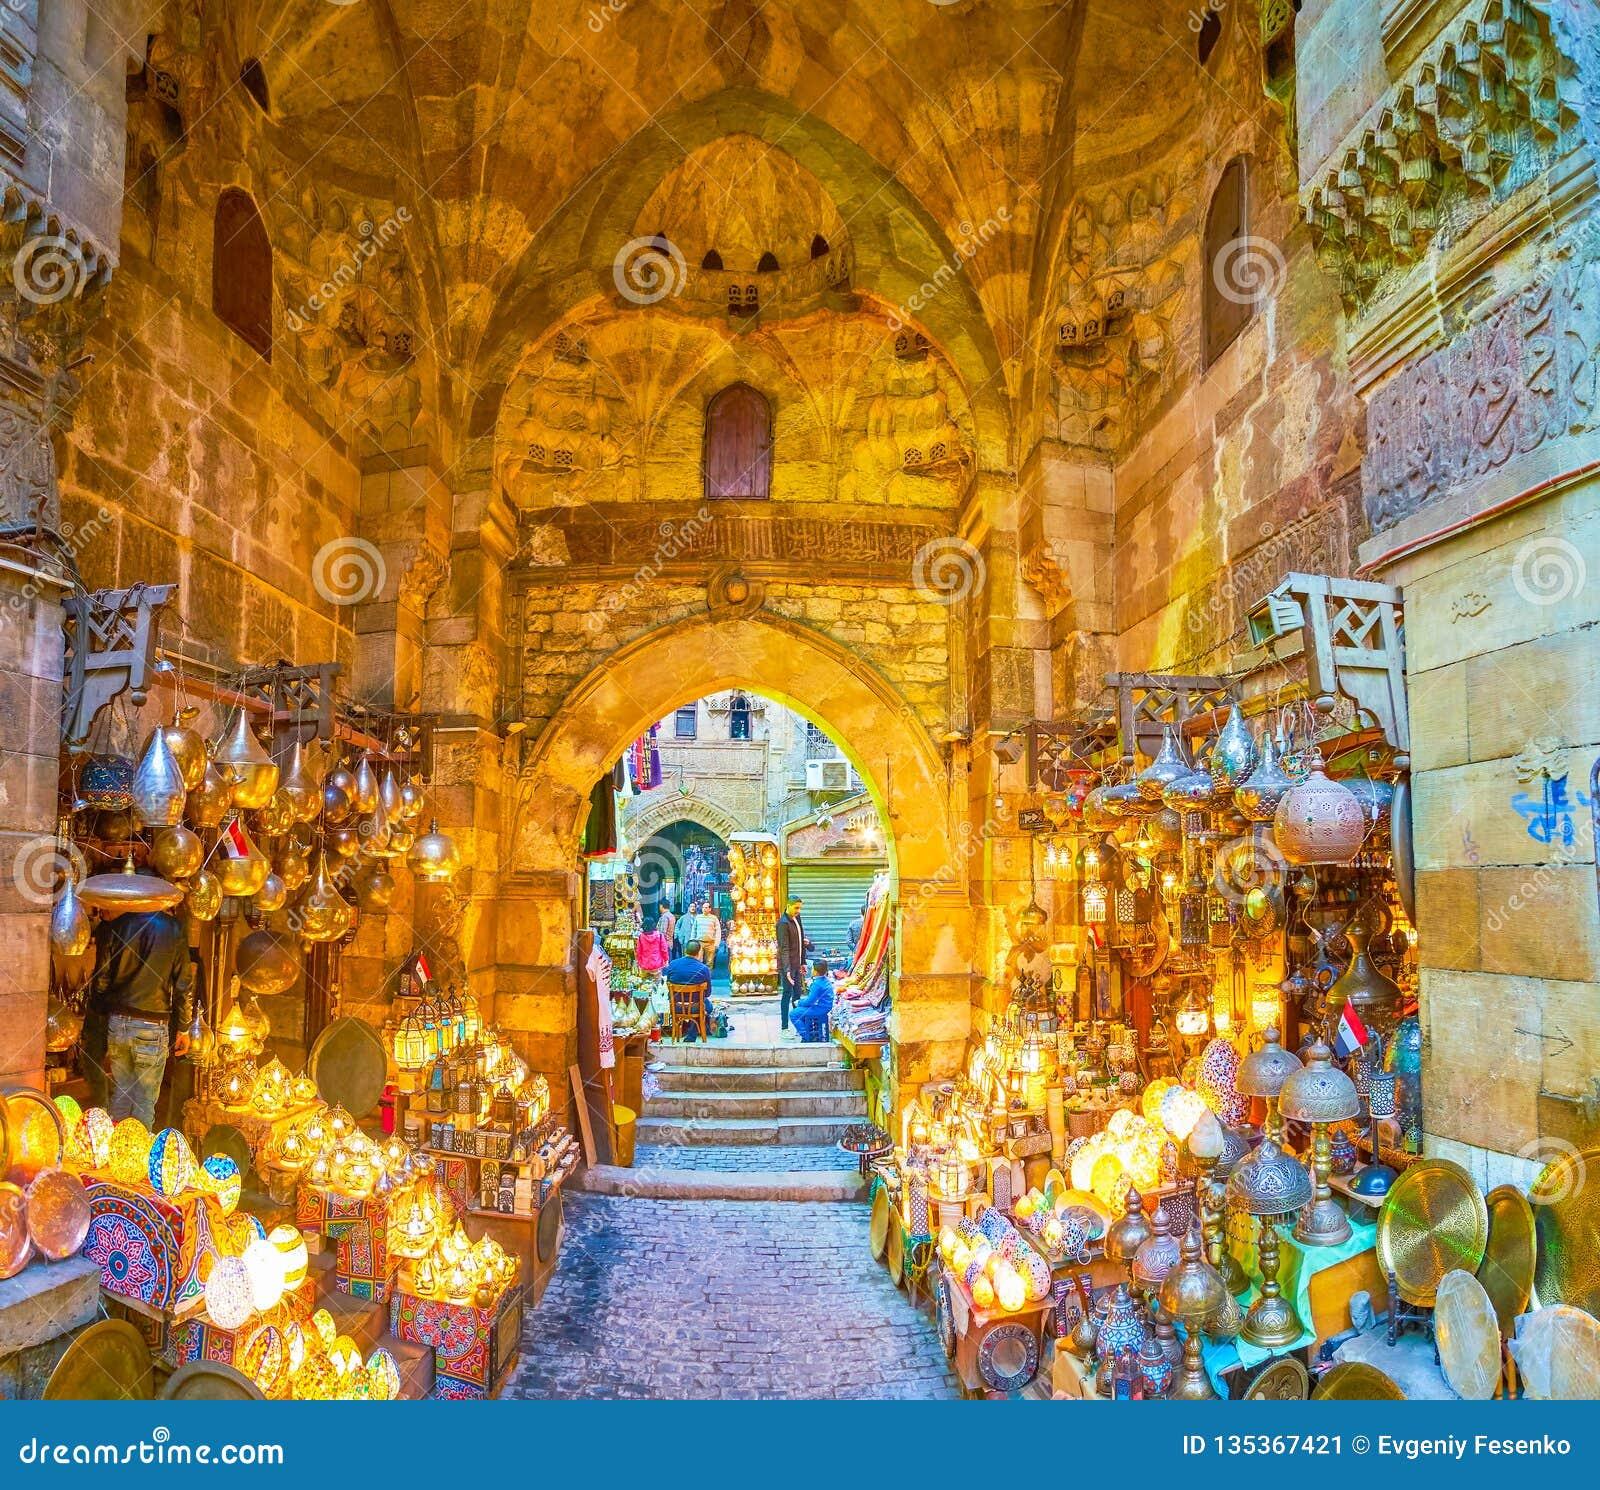 The scenic shop in Khan El-Khalili market, Cairo, Egypt